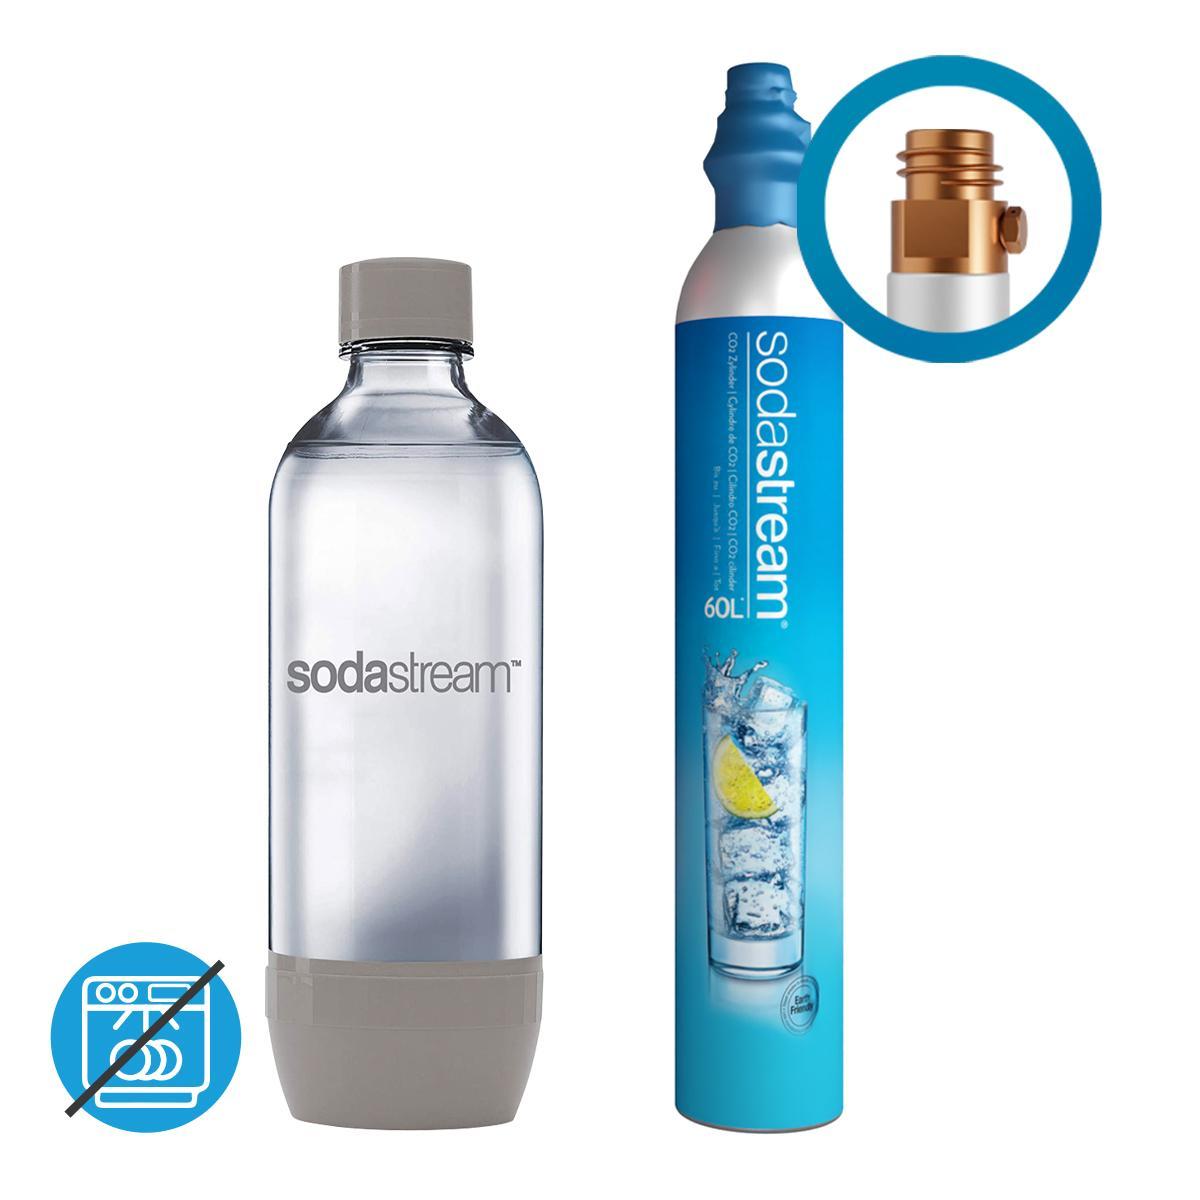 Afbeelding van SodaStream CO2 cilinder / Flessen Promo Pack I